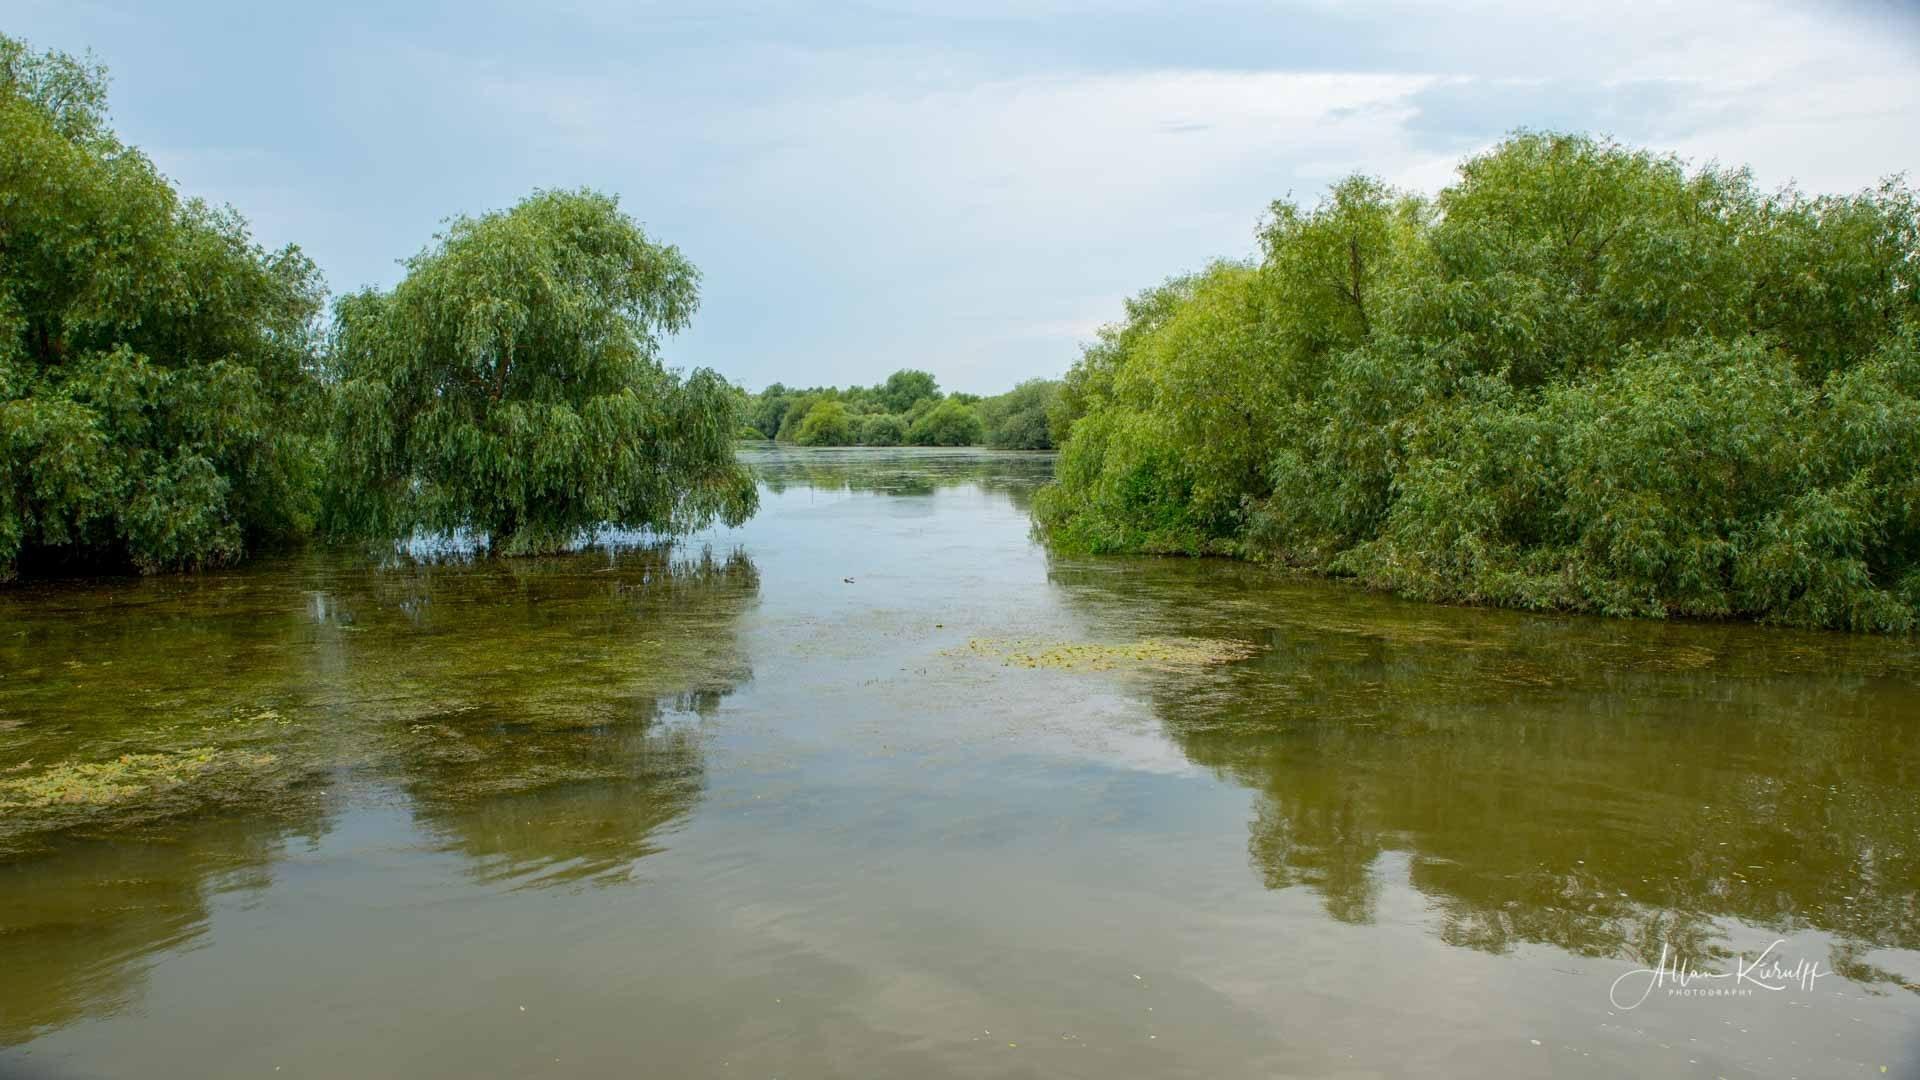 Donau Deltaet 41